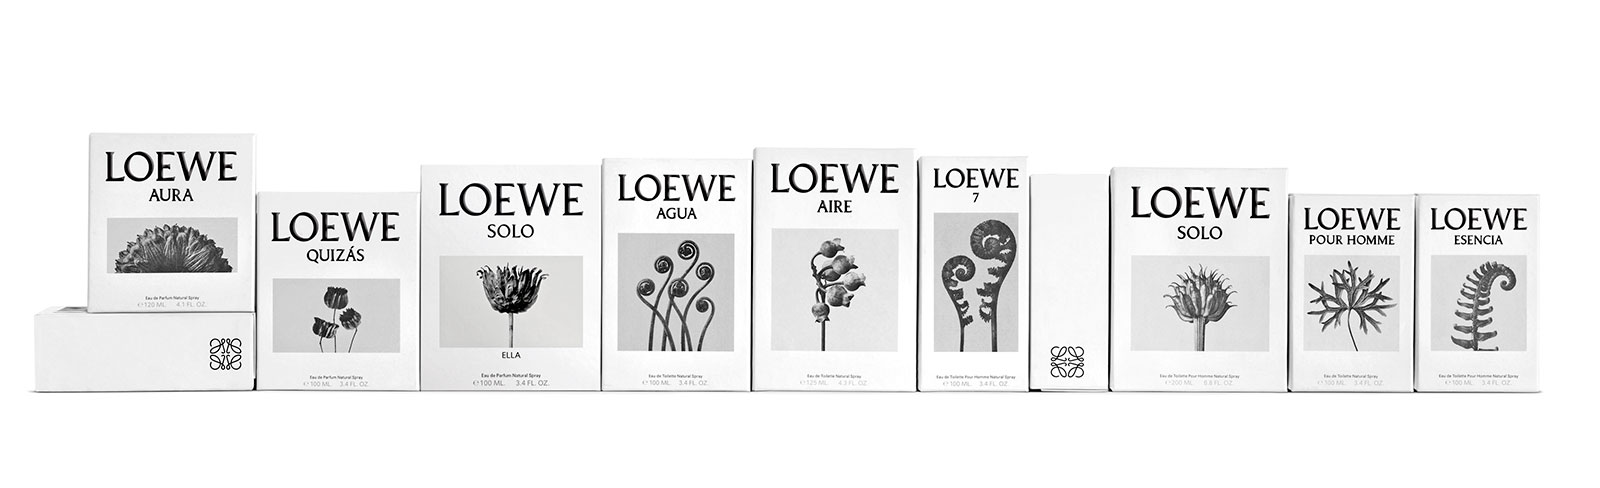 perfumes loewe.com ayere loco